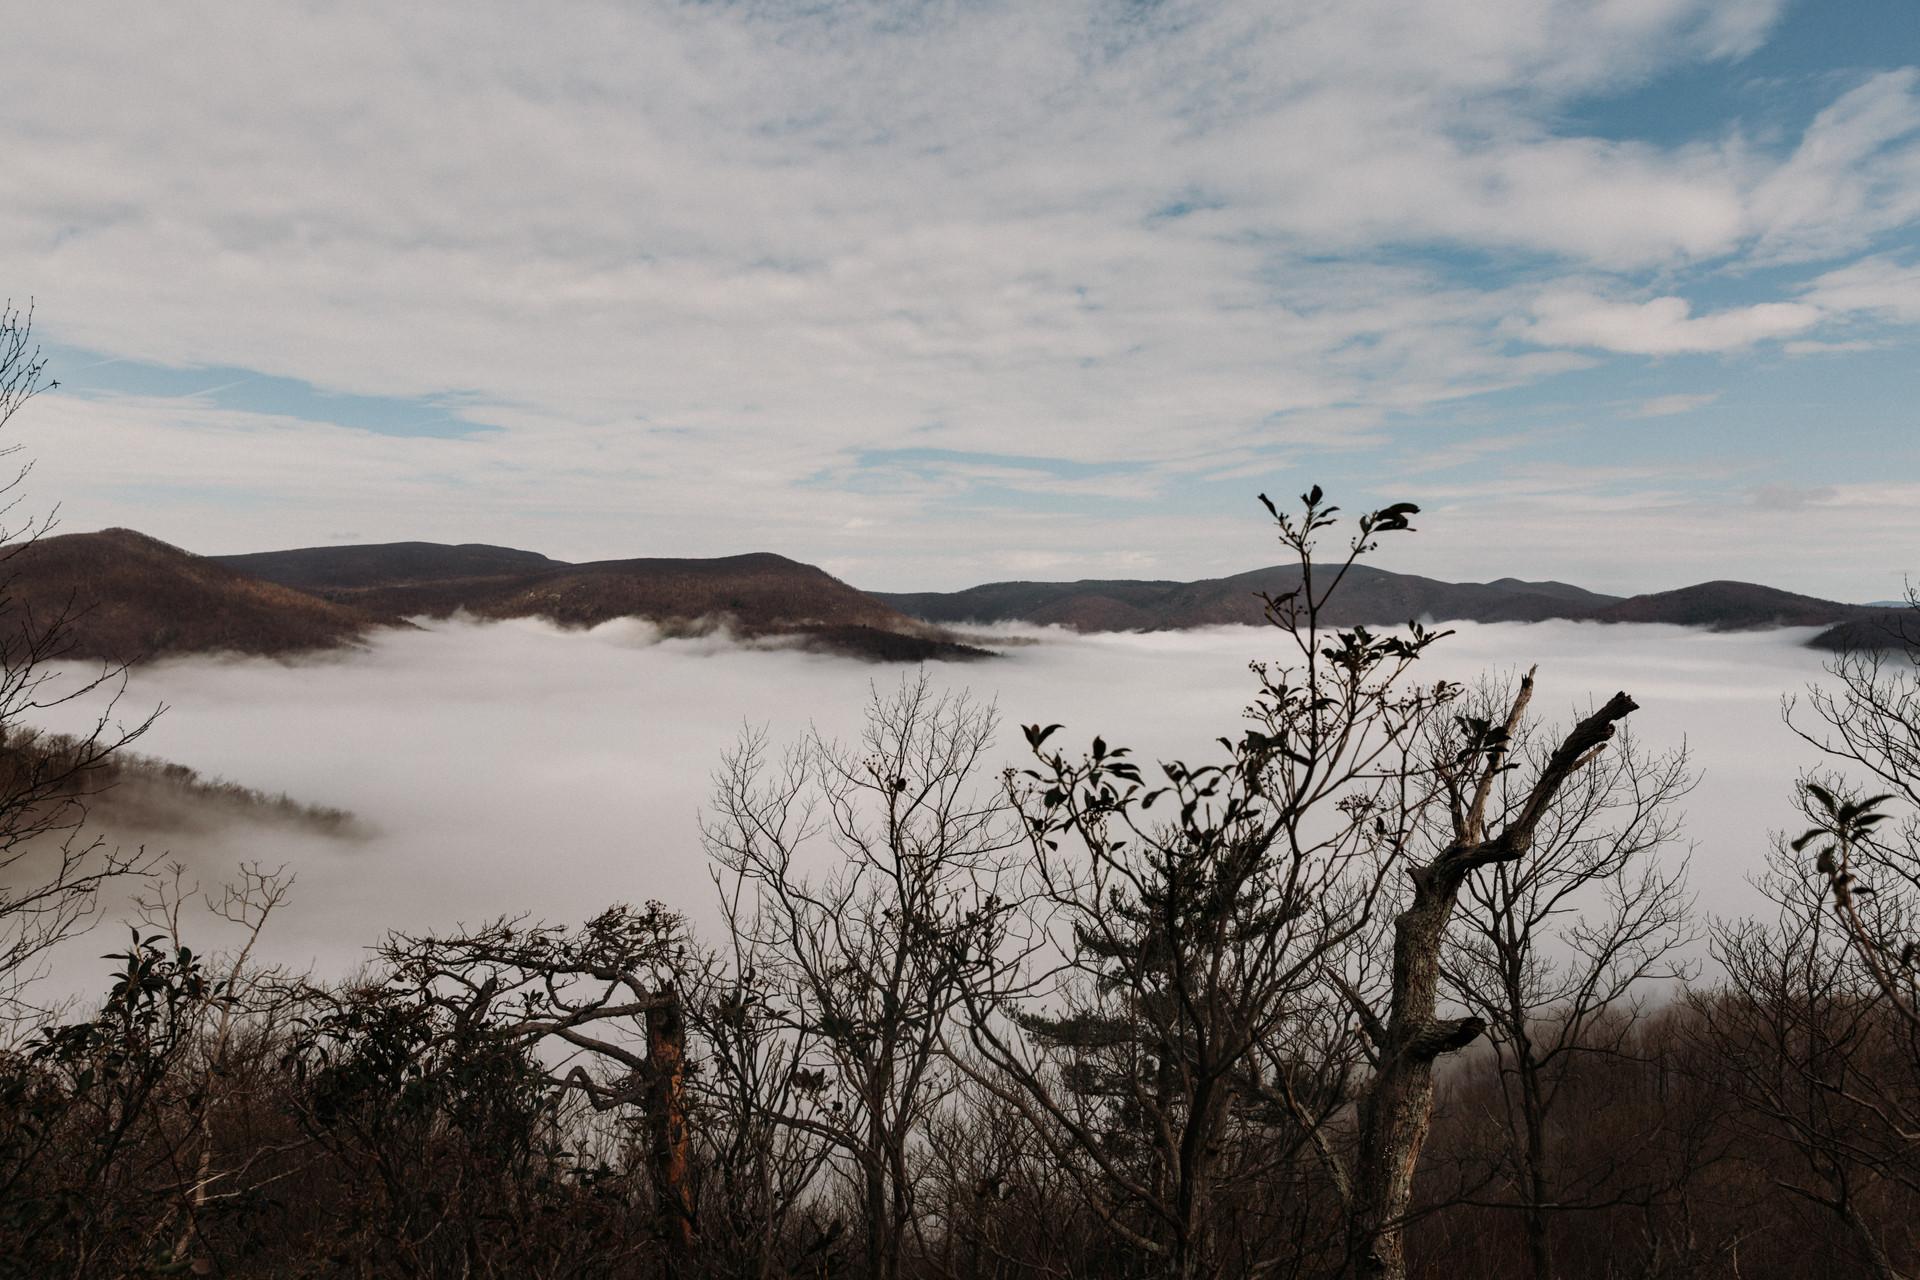 Old Rag Mountain Hike